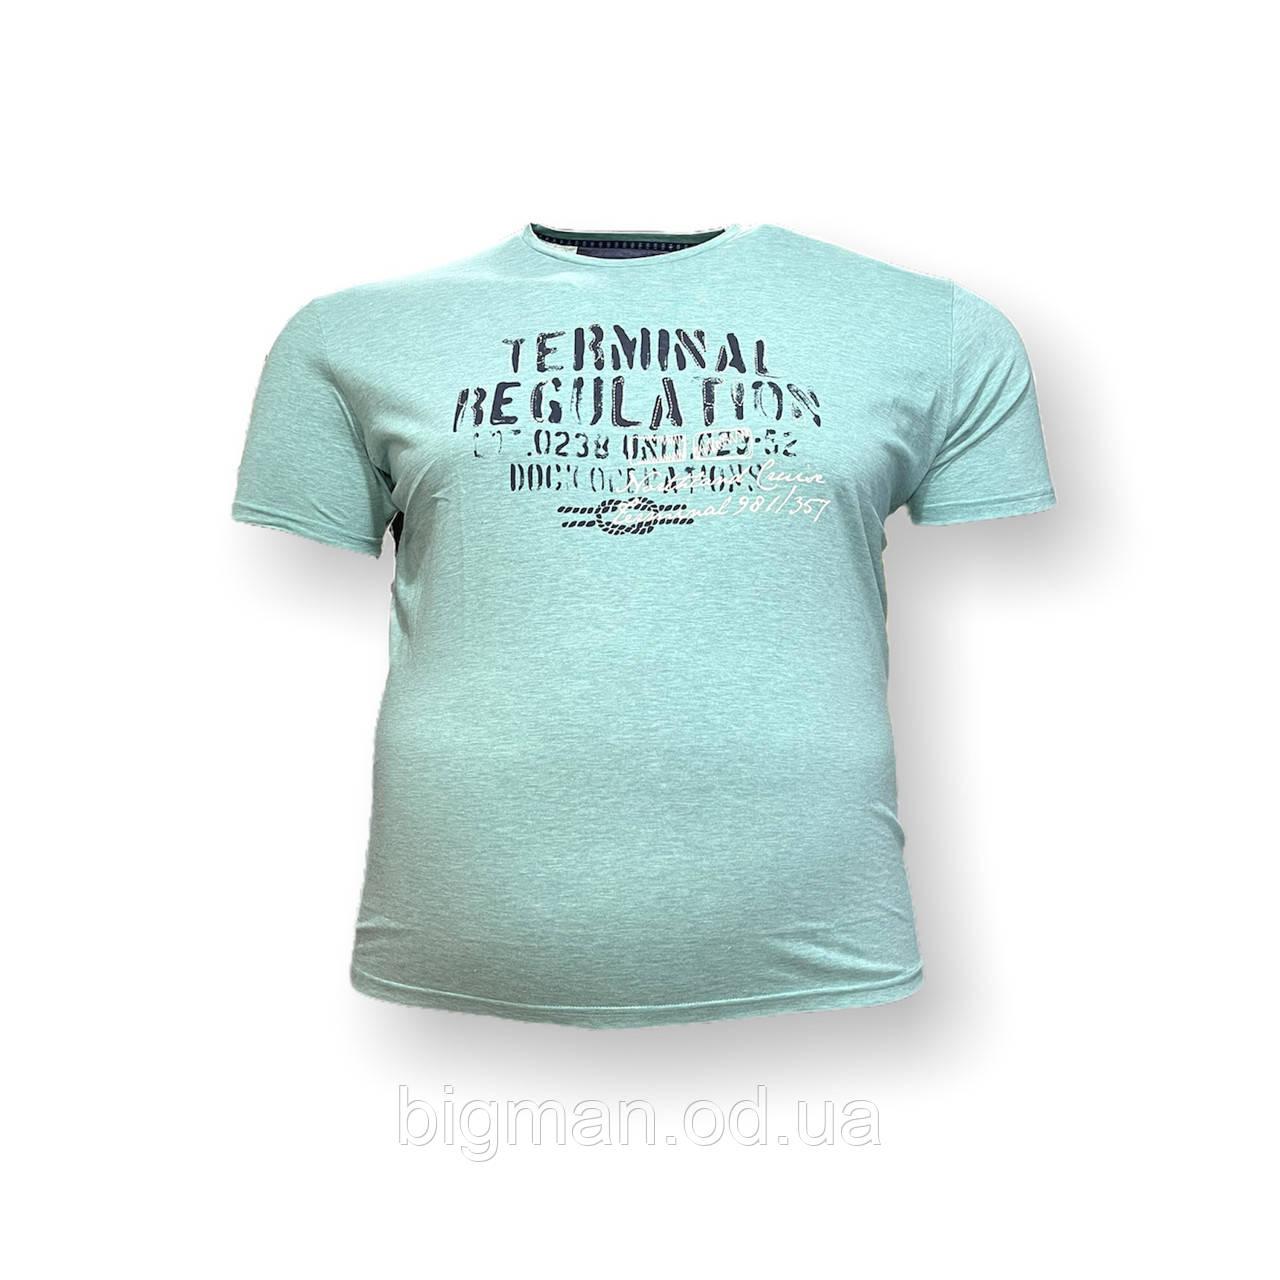 Мужская батальная футболка Monte Carlo 12092 3XL 4XL 5XL 6XL 7XL бирюзовый большие размеры Турция